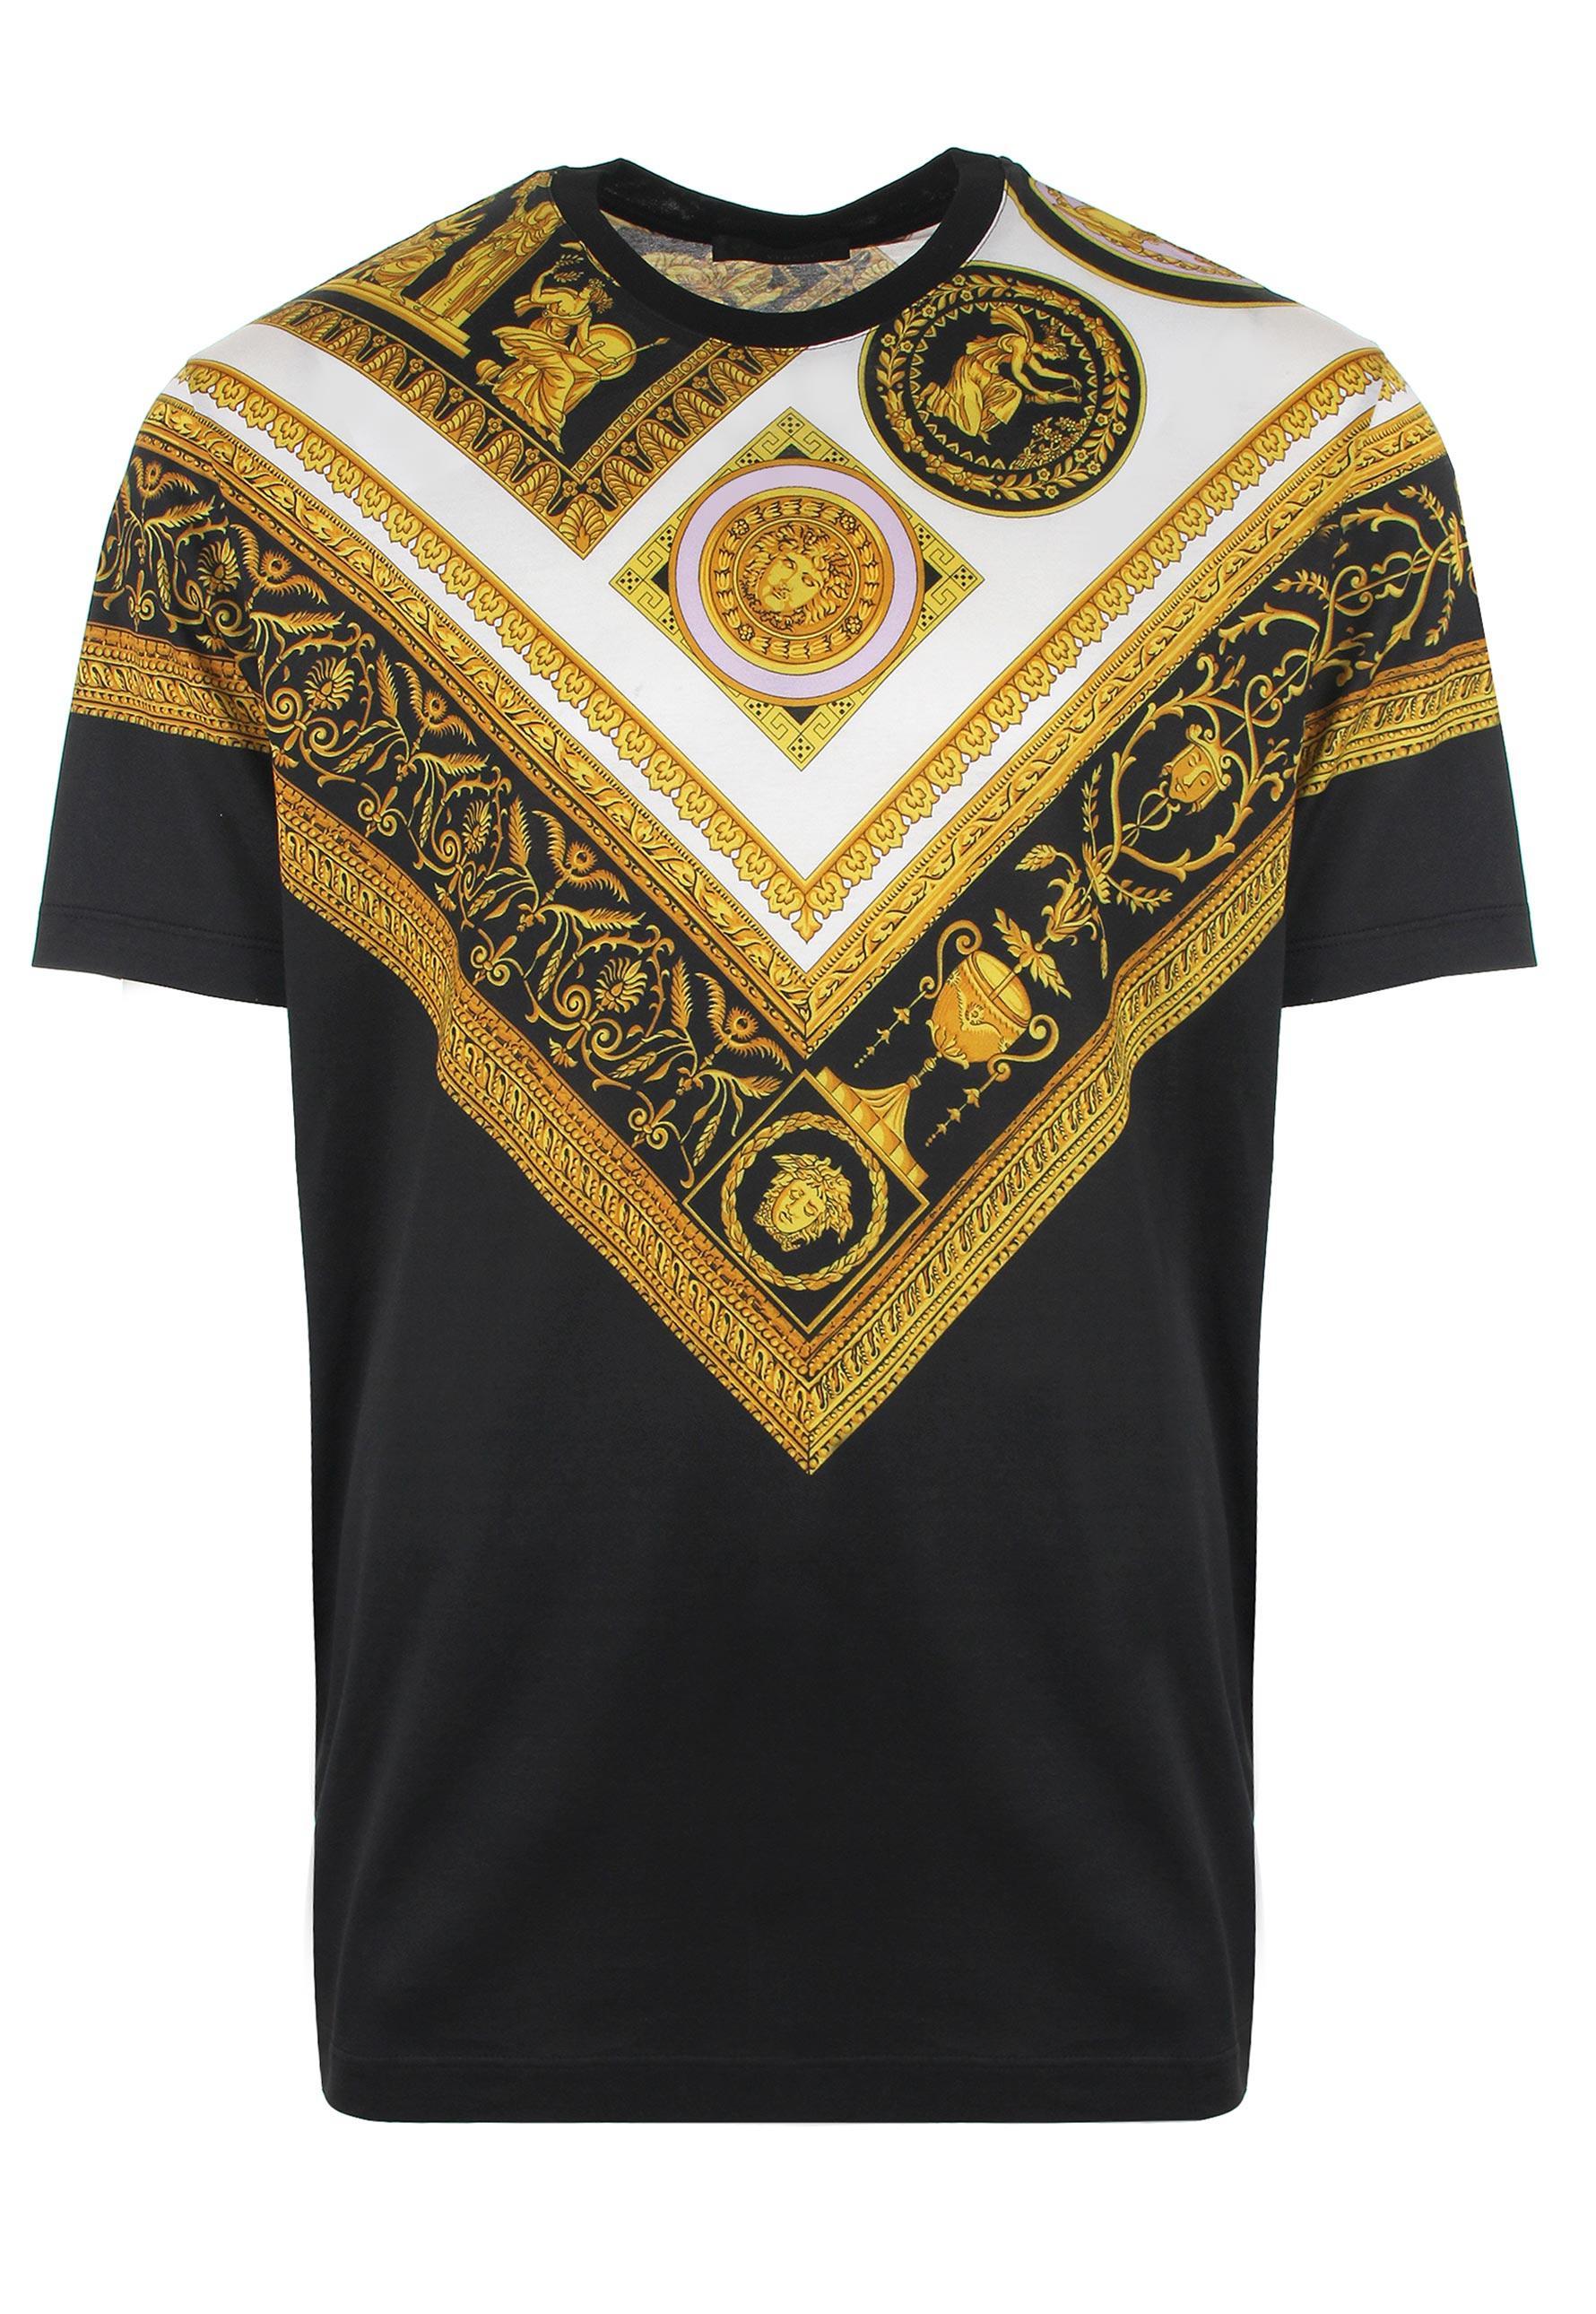 a3a3e6ba2 Versace True Greca V T-shirt Black/gold in Black for Men - Lyst